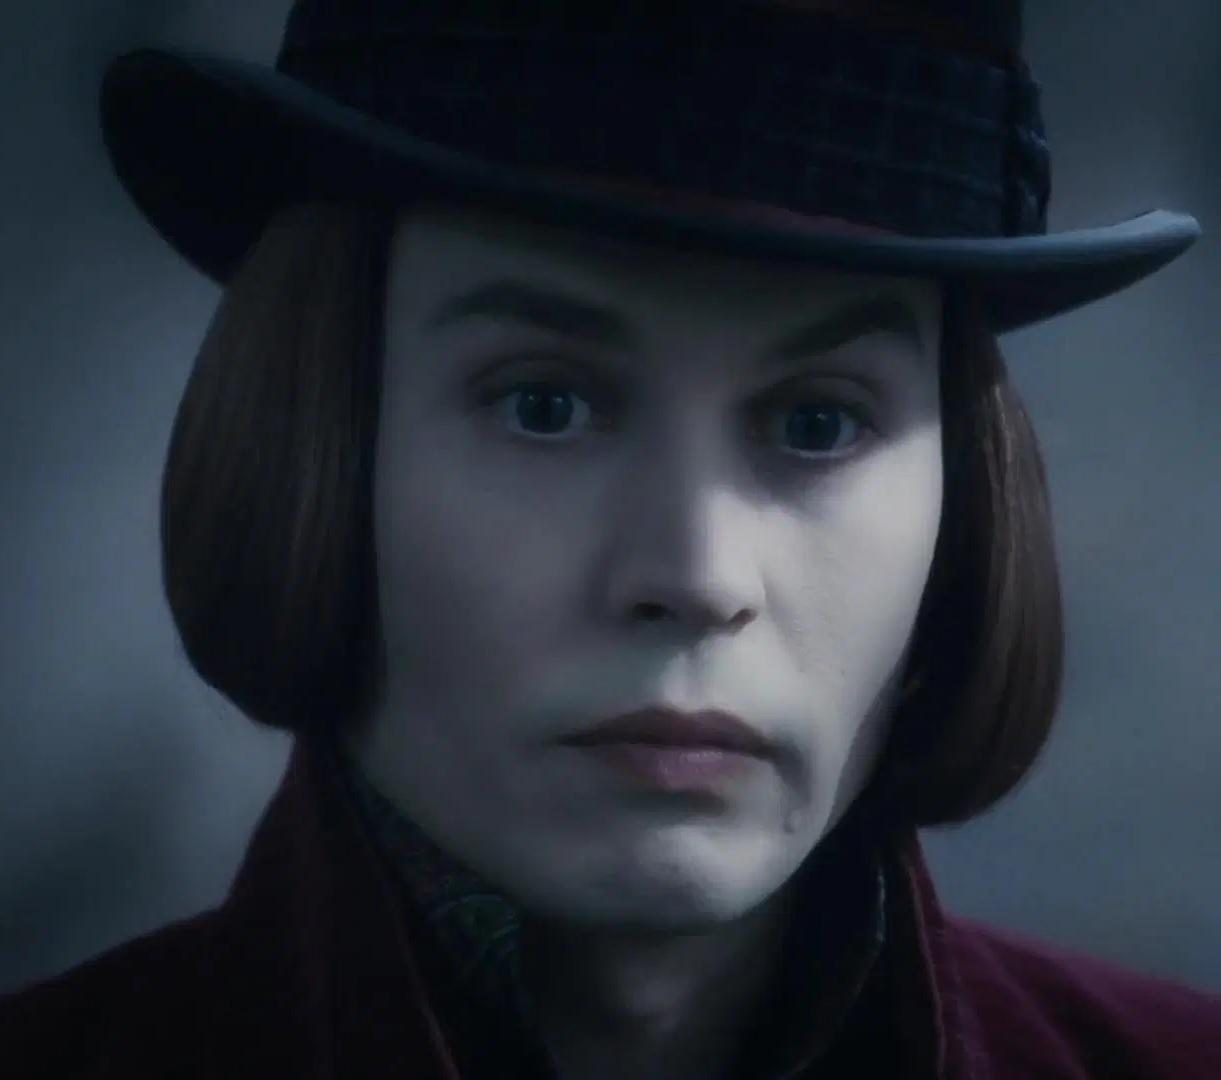 File:Johnny Depp as Willy Wonka.jpg